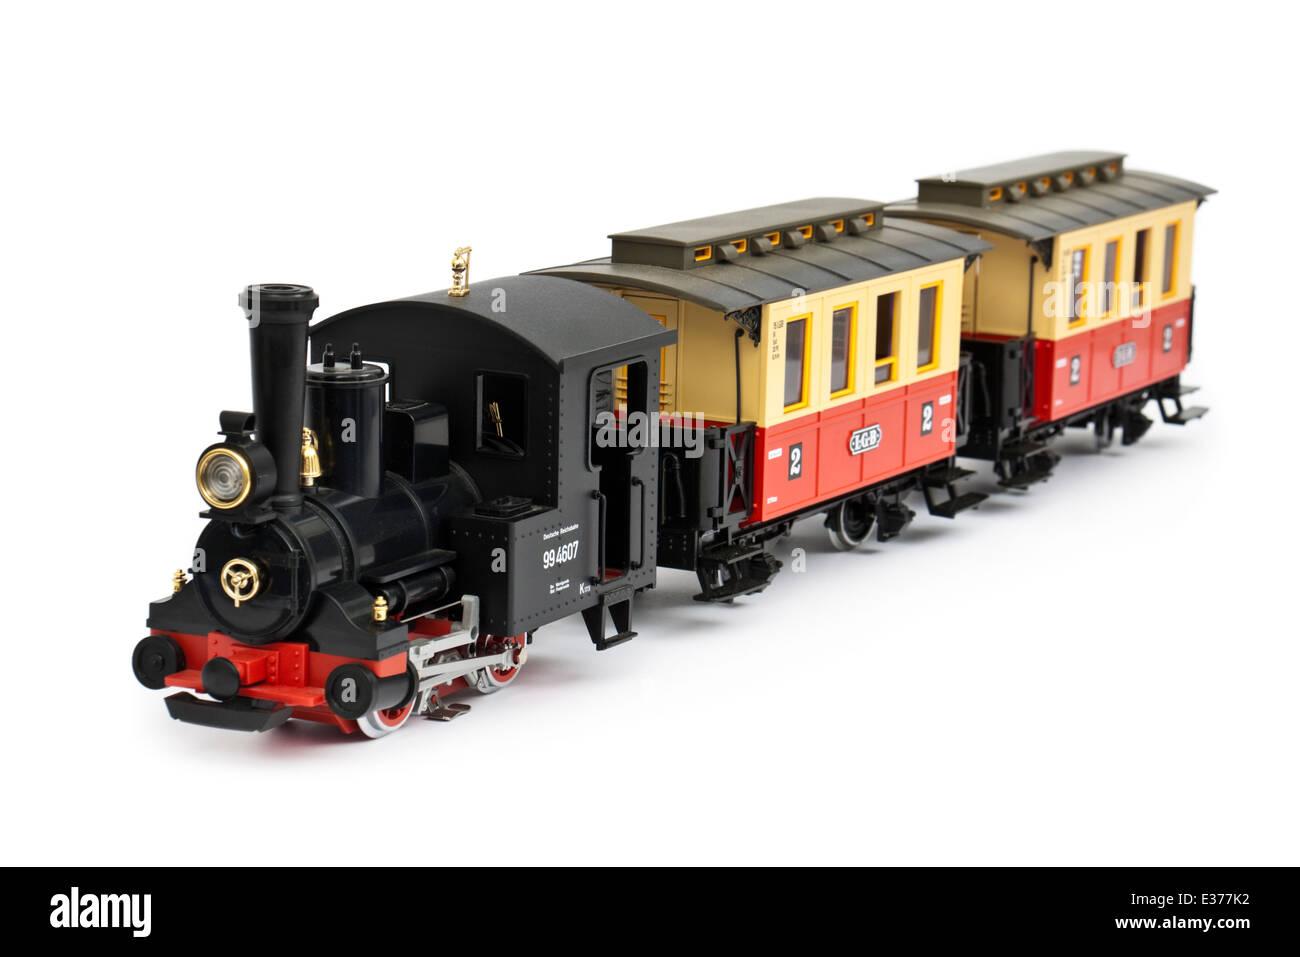 LGB (Lehmann Garden Railway) 92075.5 Dr Class 994607 G-Scale 0-4-0 Tank Locomotive with Passenger Coaches - Stock Image